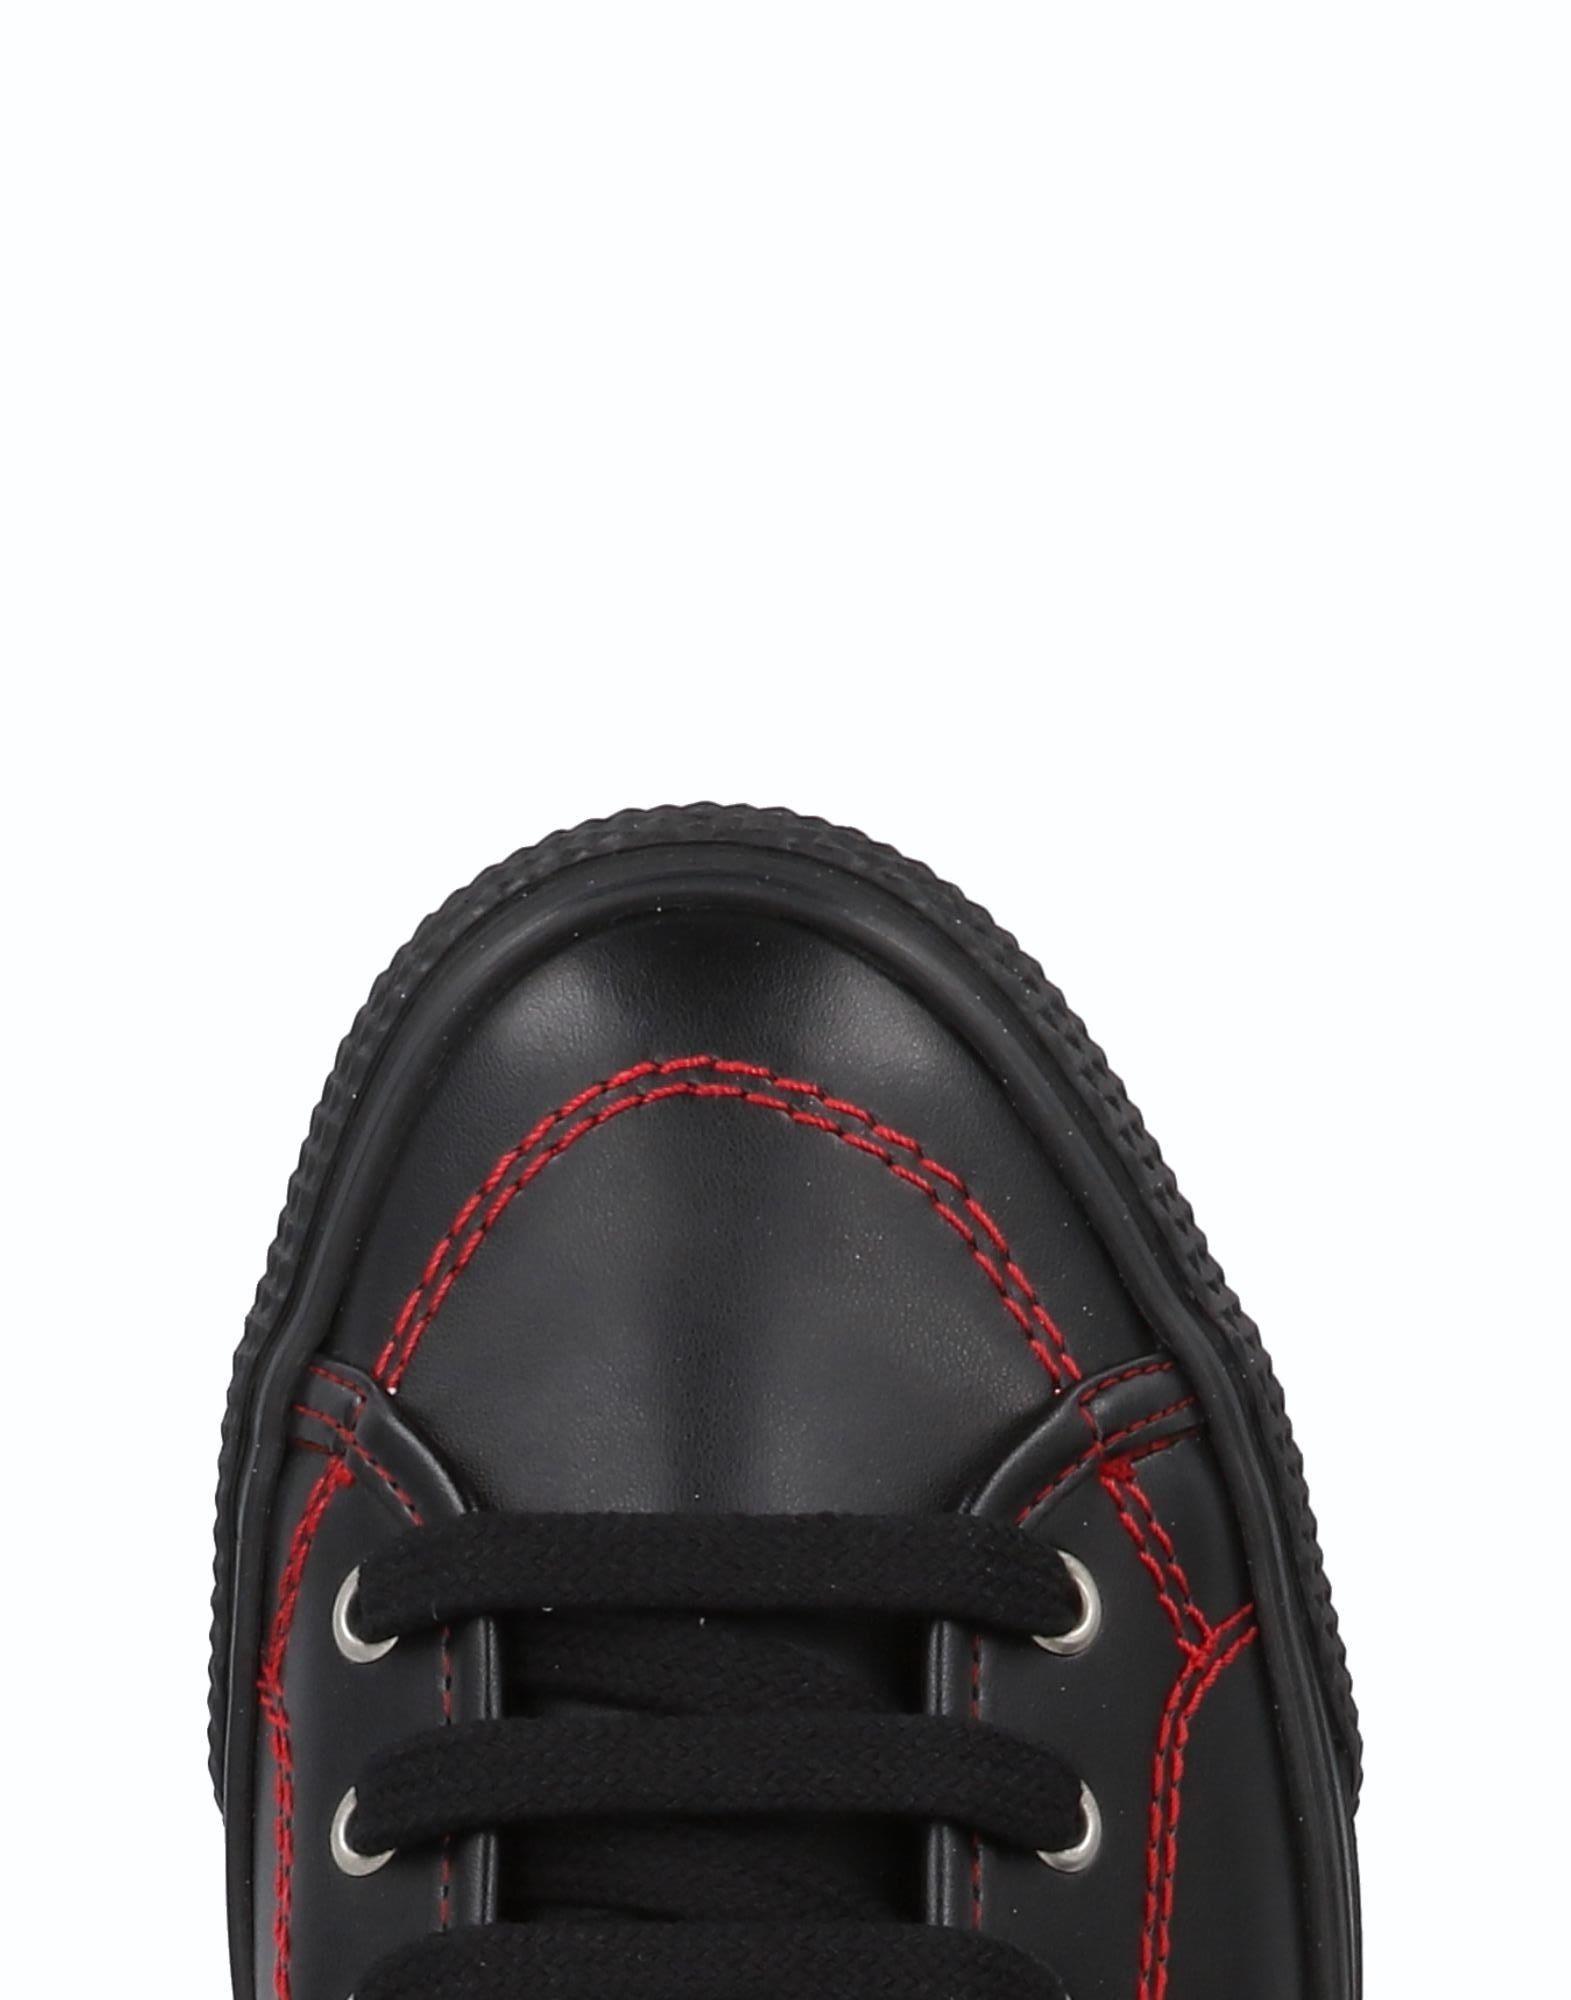 Stella Mccartney Herren Sneakers Herren Mccartney  11467097QP 98d8b2